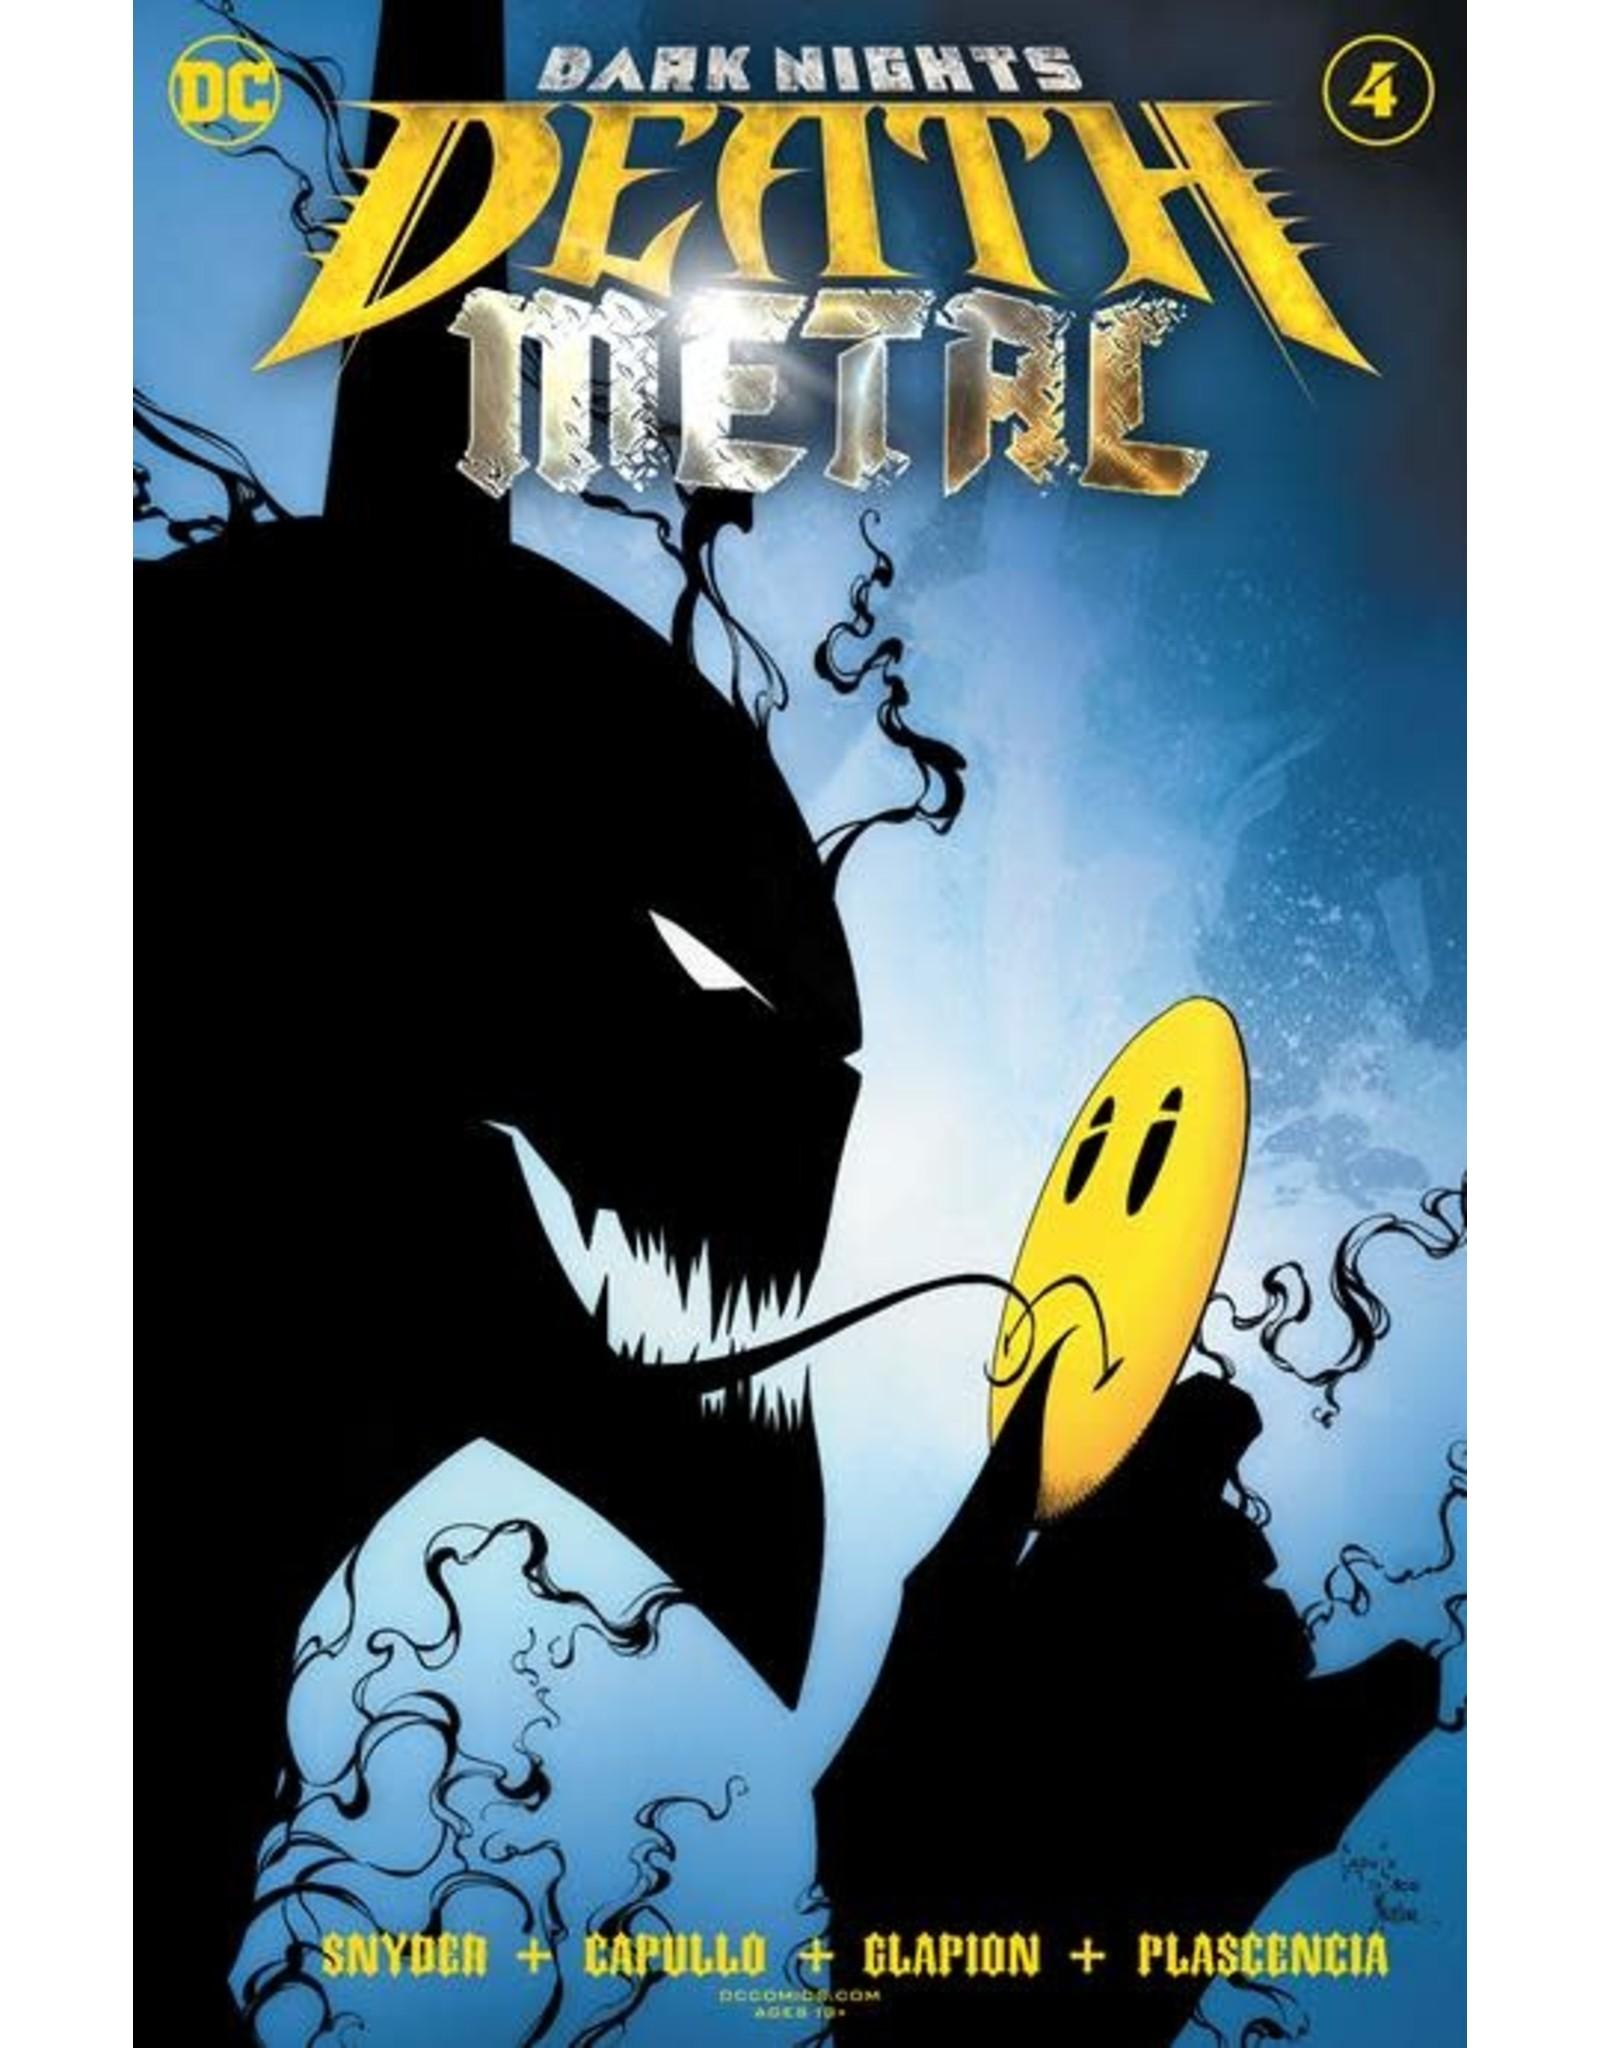 DC Comics DARK NIGHTS DEATH METAL #4 (OF 7) CVR A GREG CAPULLO & JONATHAN GLAPION FOIL EMBOSSED